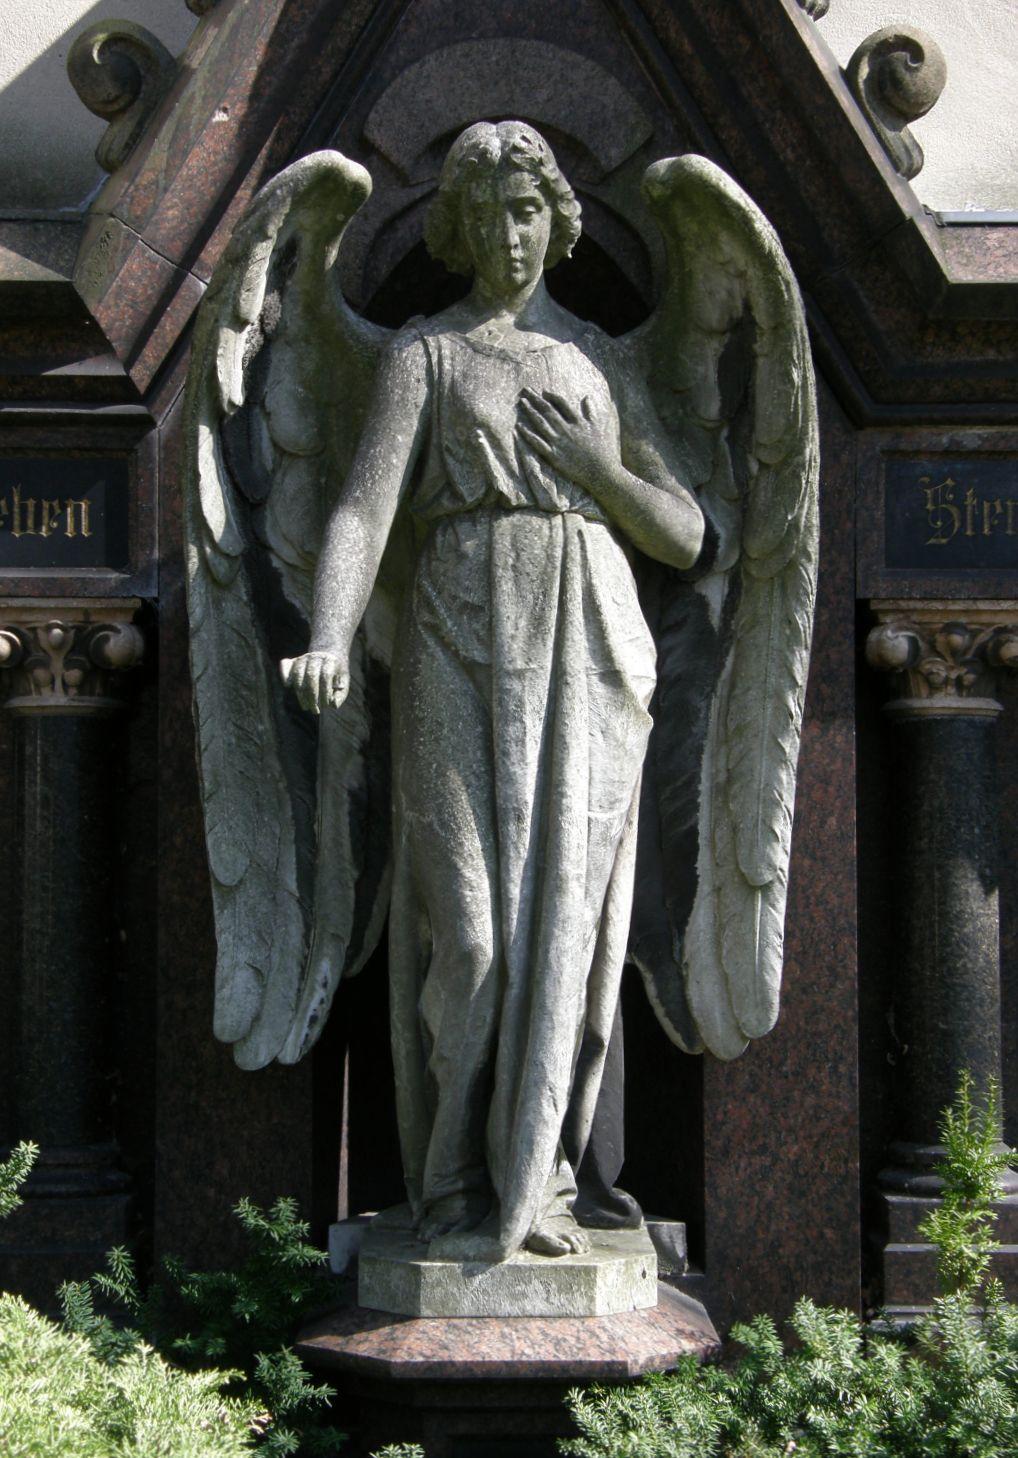 http://de.academic.ru/pictures/dewiki/70/Friedhof_Wilmersdorf_-_August_Bauer_-_Engel_Grabst%C3%A4tte_Bolze.jpg